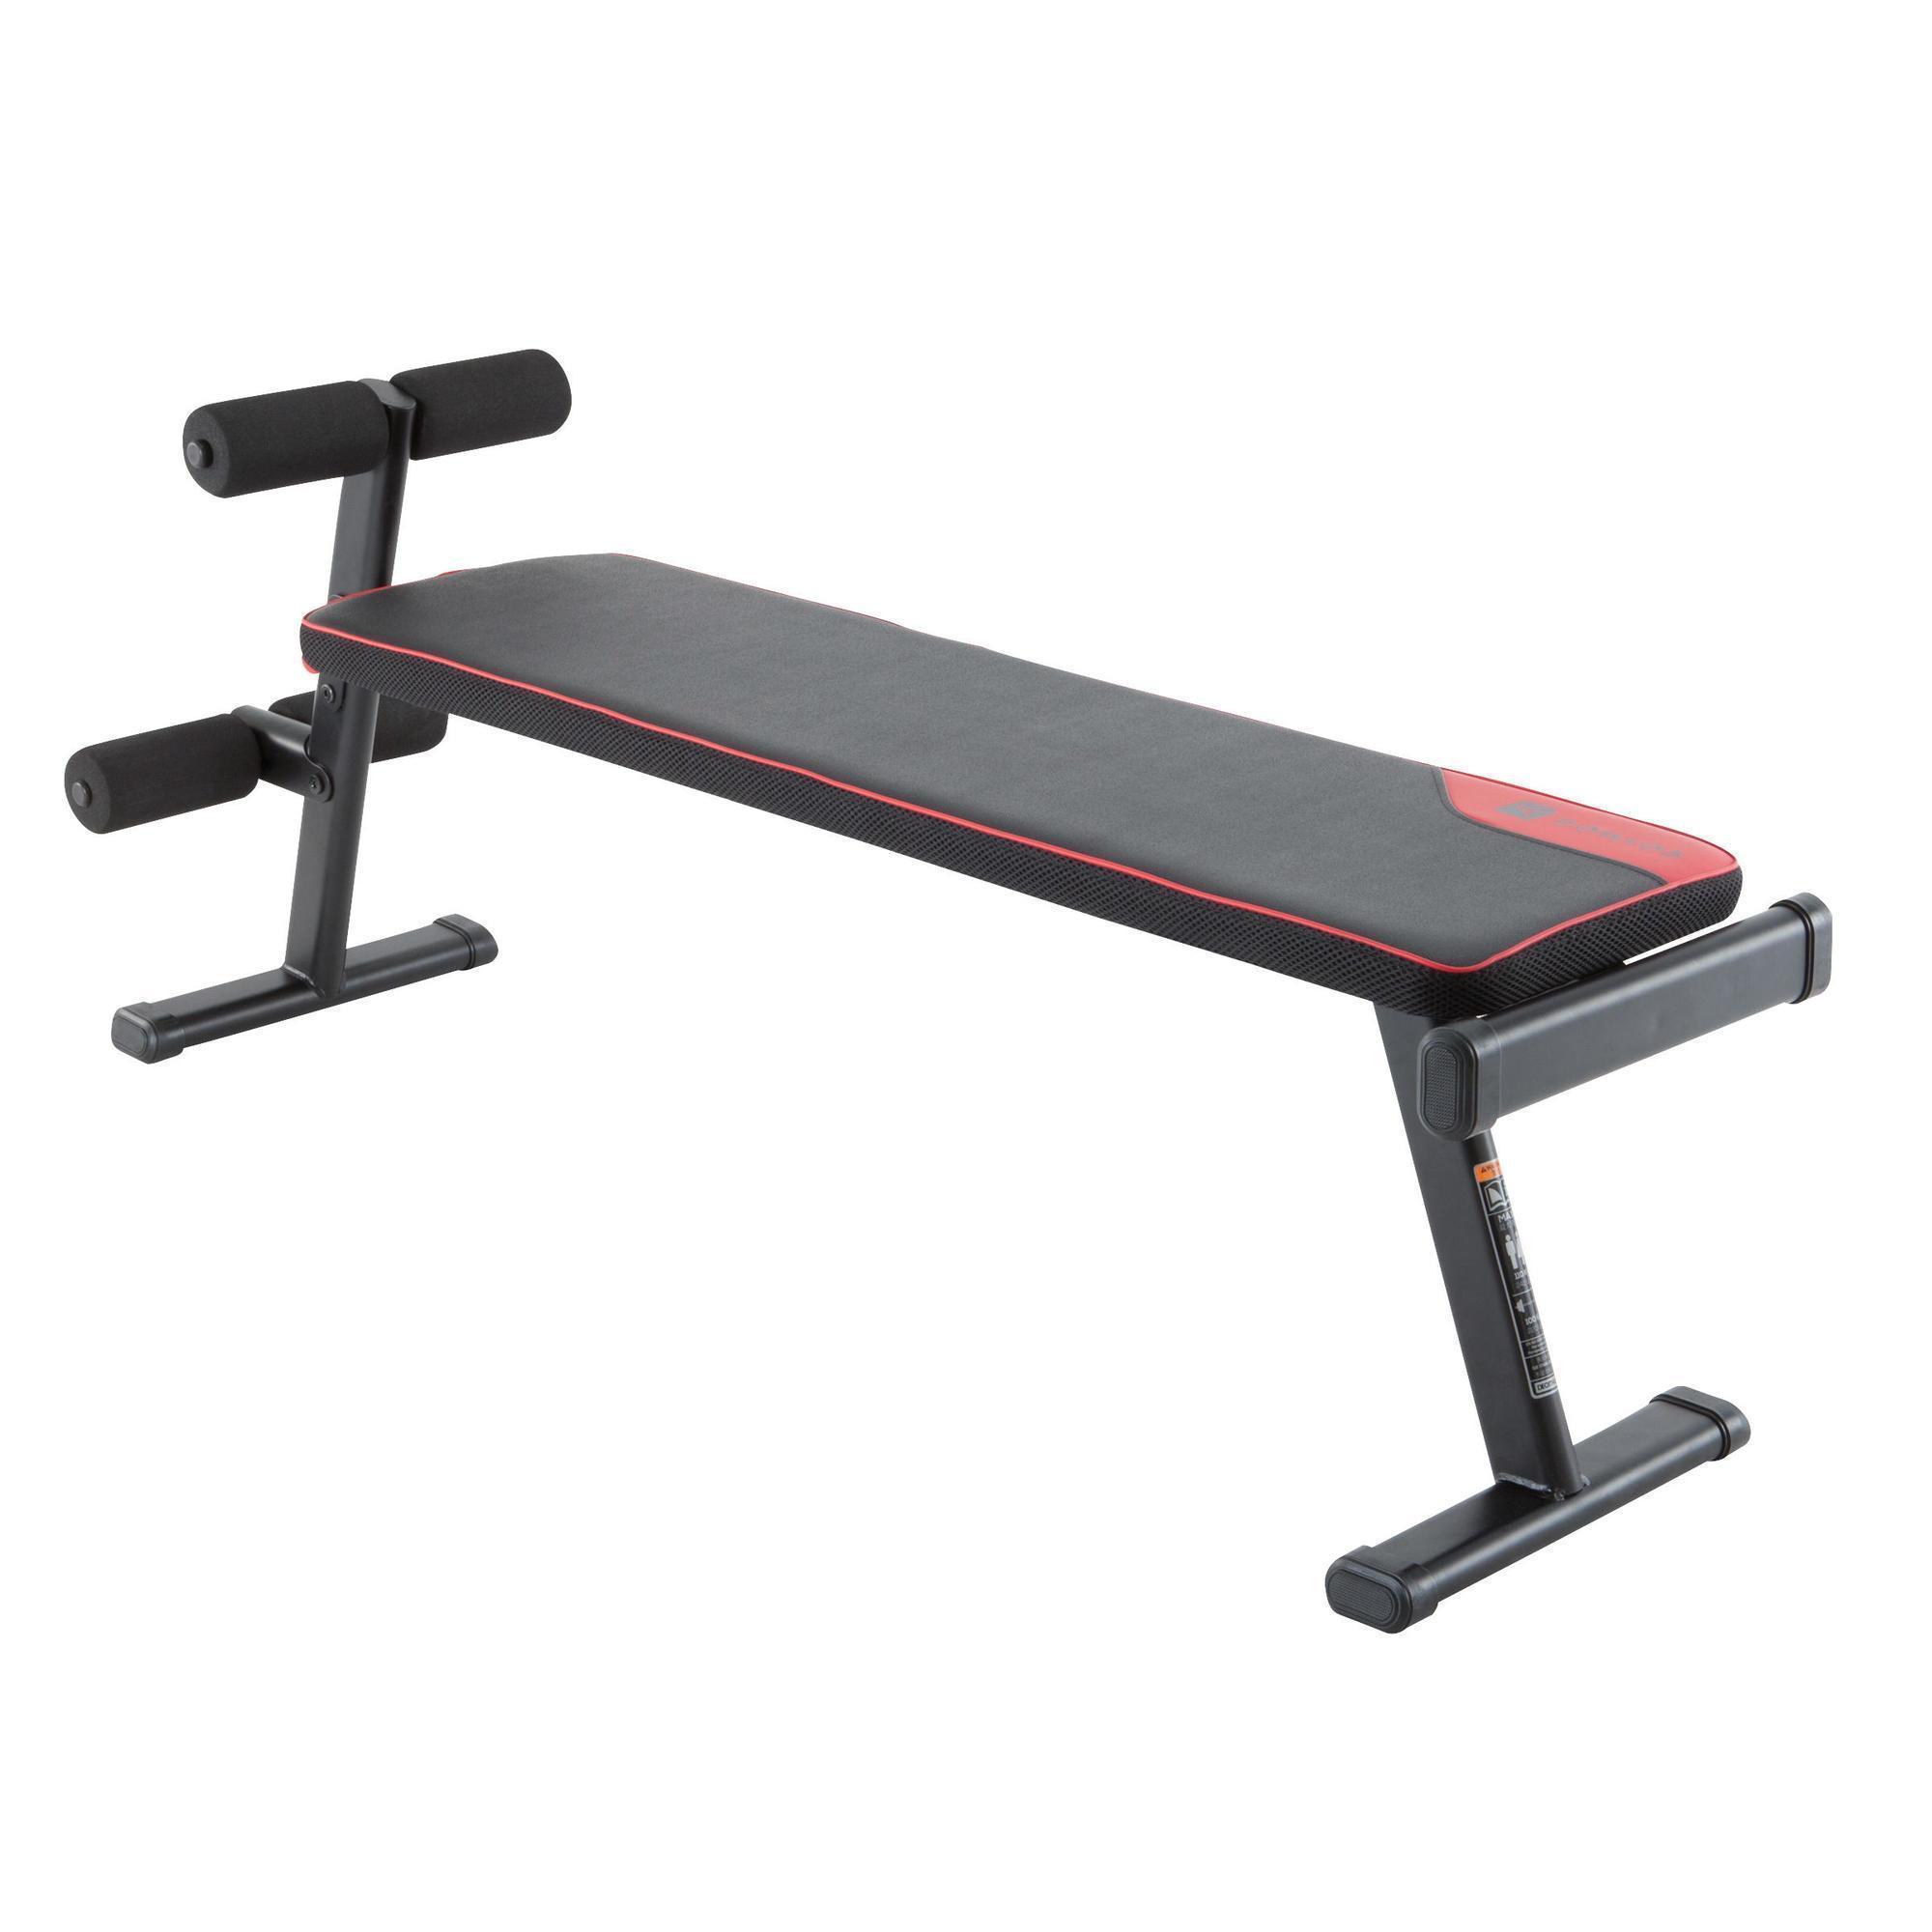 Bench Press Abs Part - 41: 100 Weight Bench